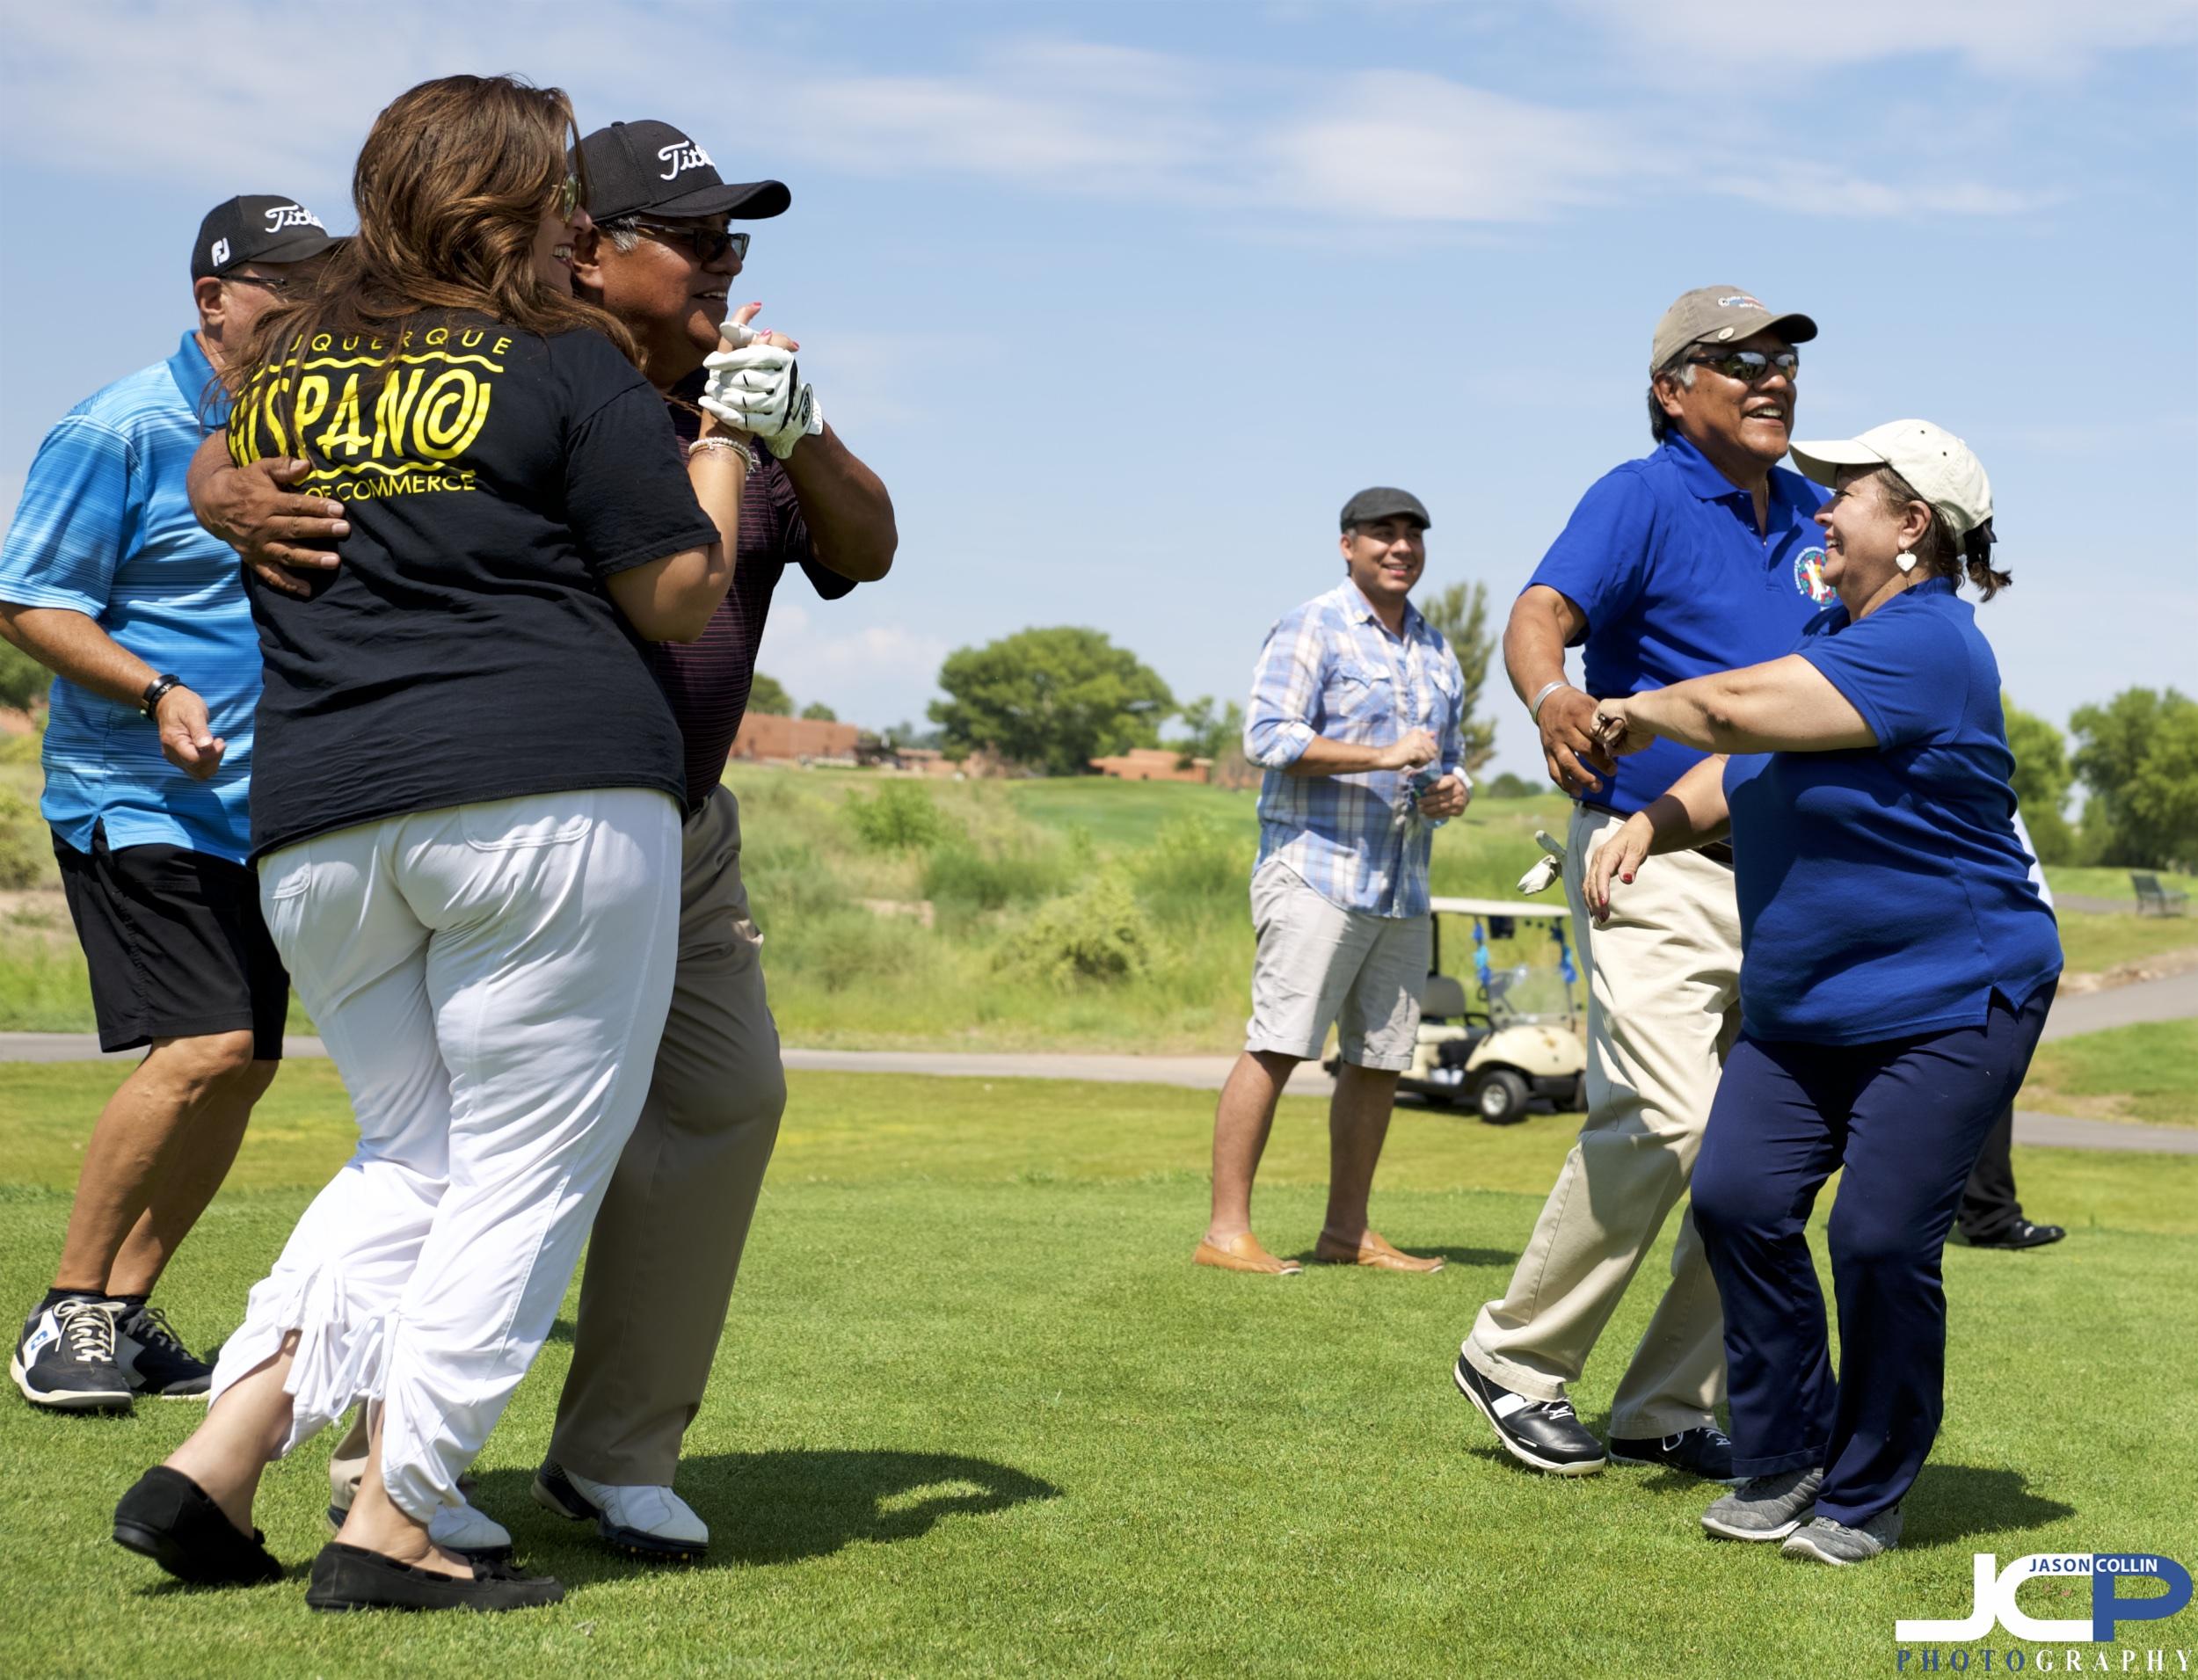 ahcc-8-16-2018-golf-100568.jpg